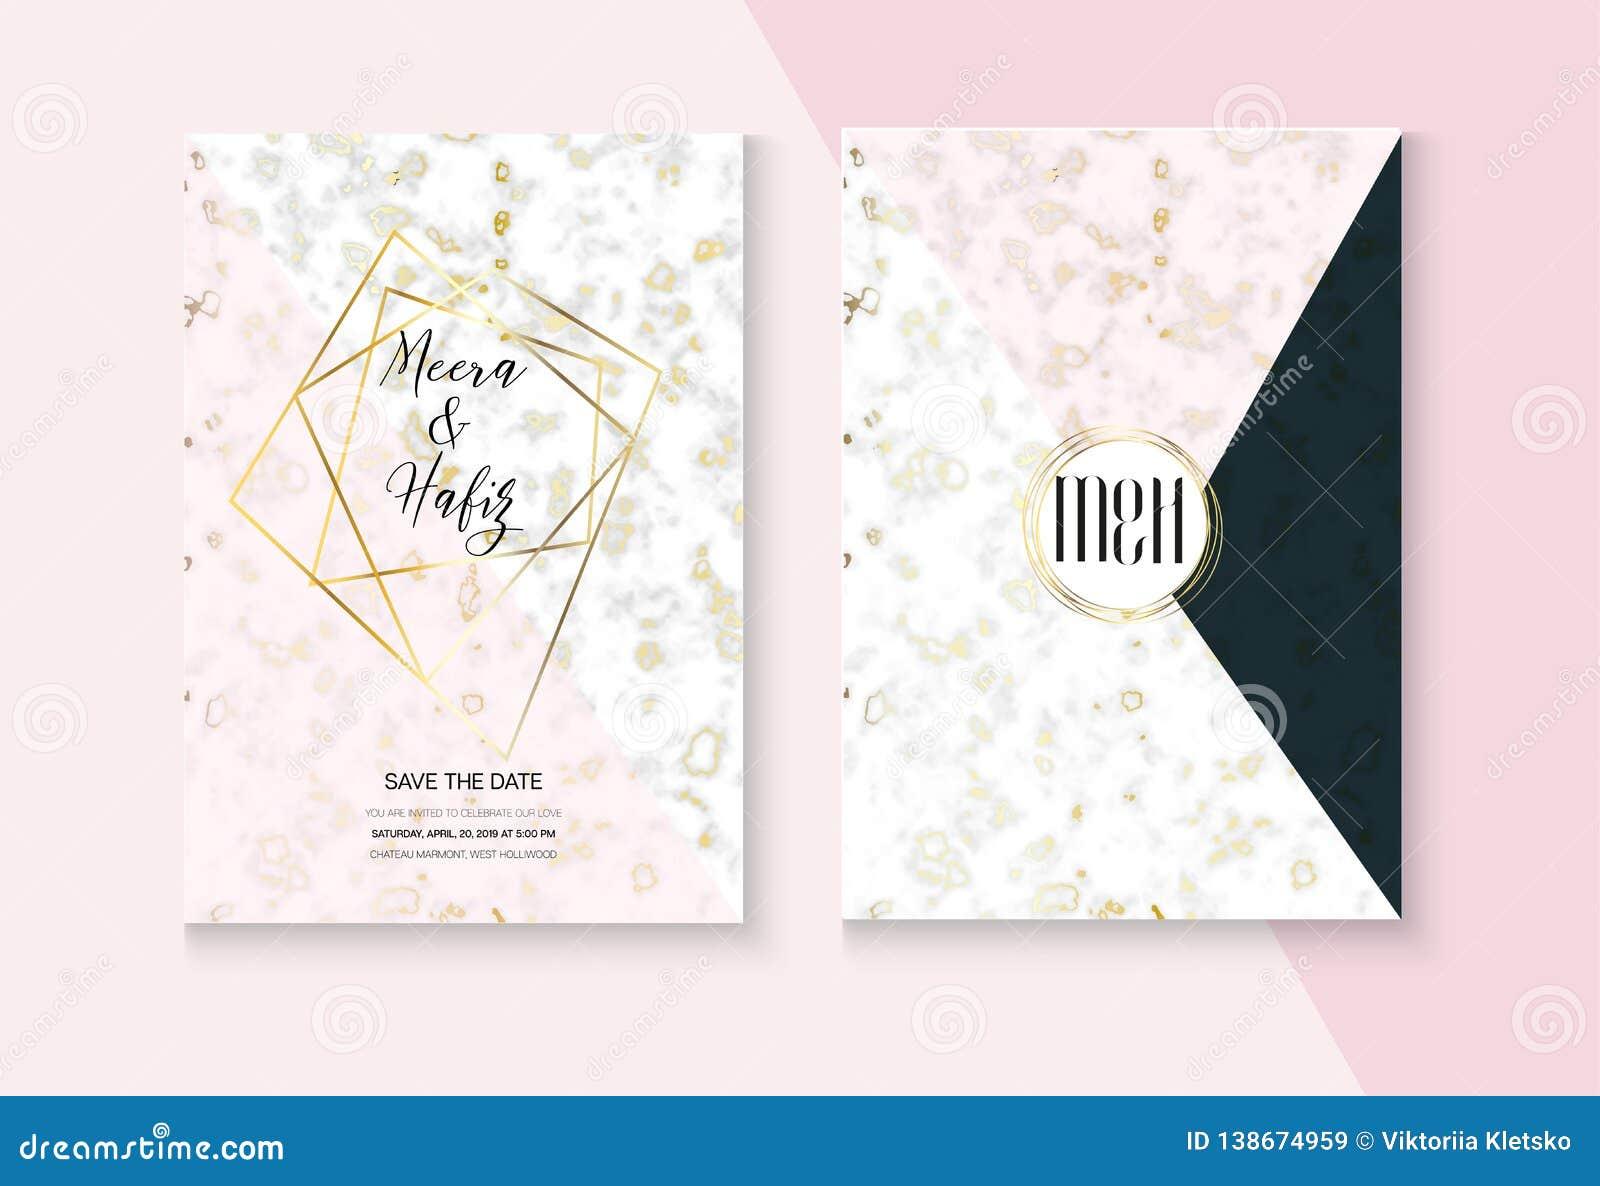 Graphic Marble Wedding Invitation Vector Set Rsvp Thank